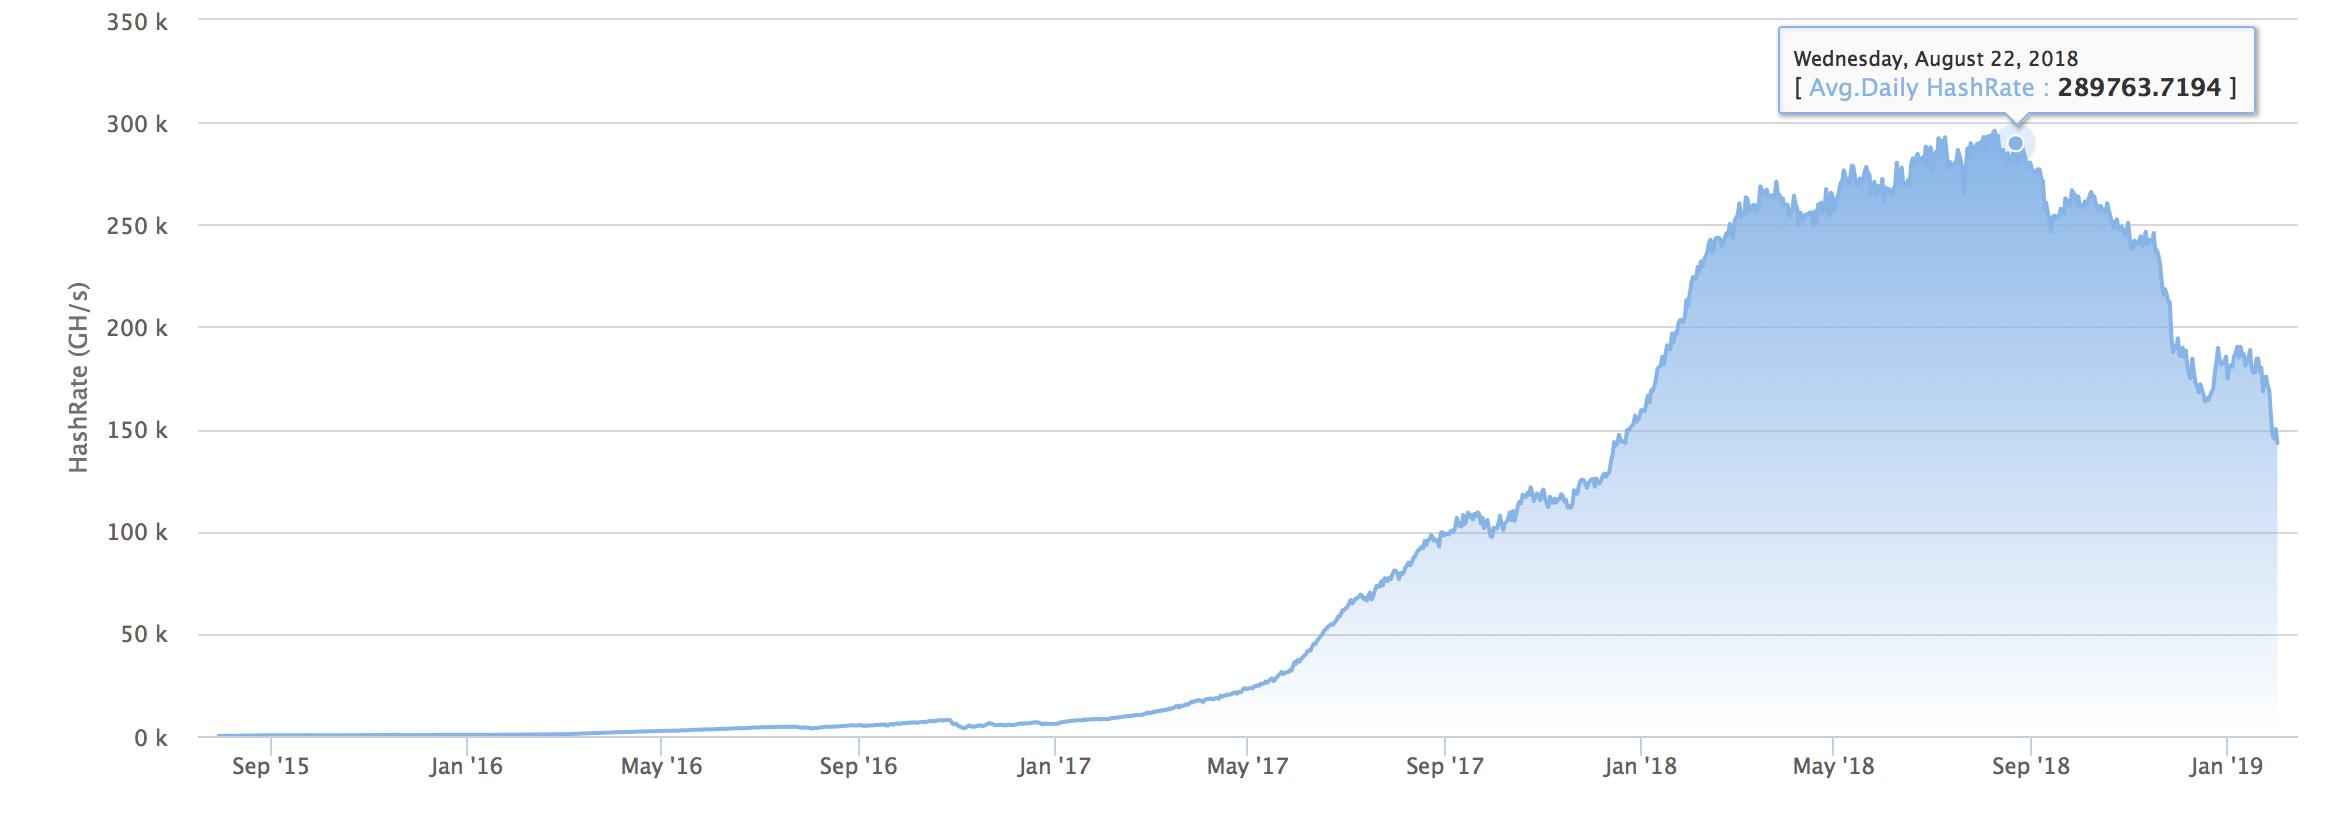 Nvidia Made Billions From Ethereum Crypto Mining Says Analyst